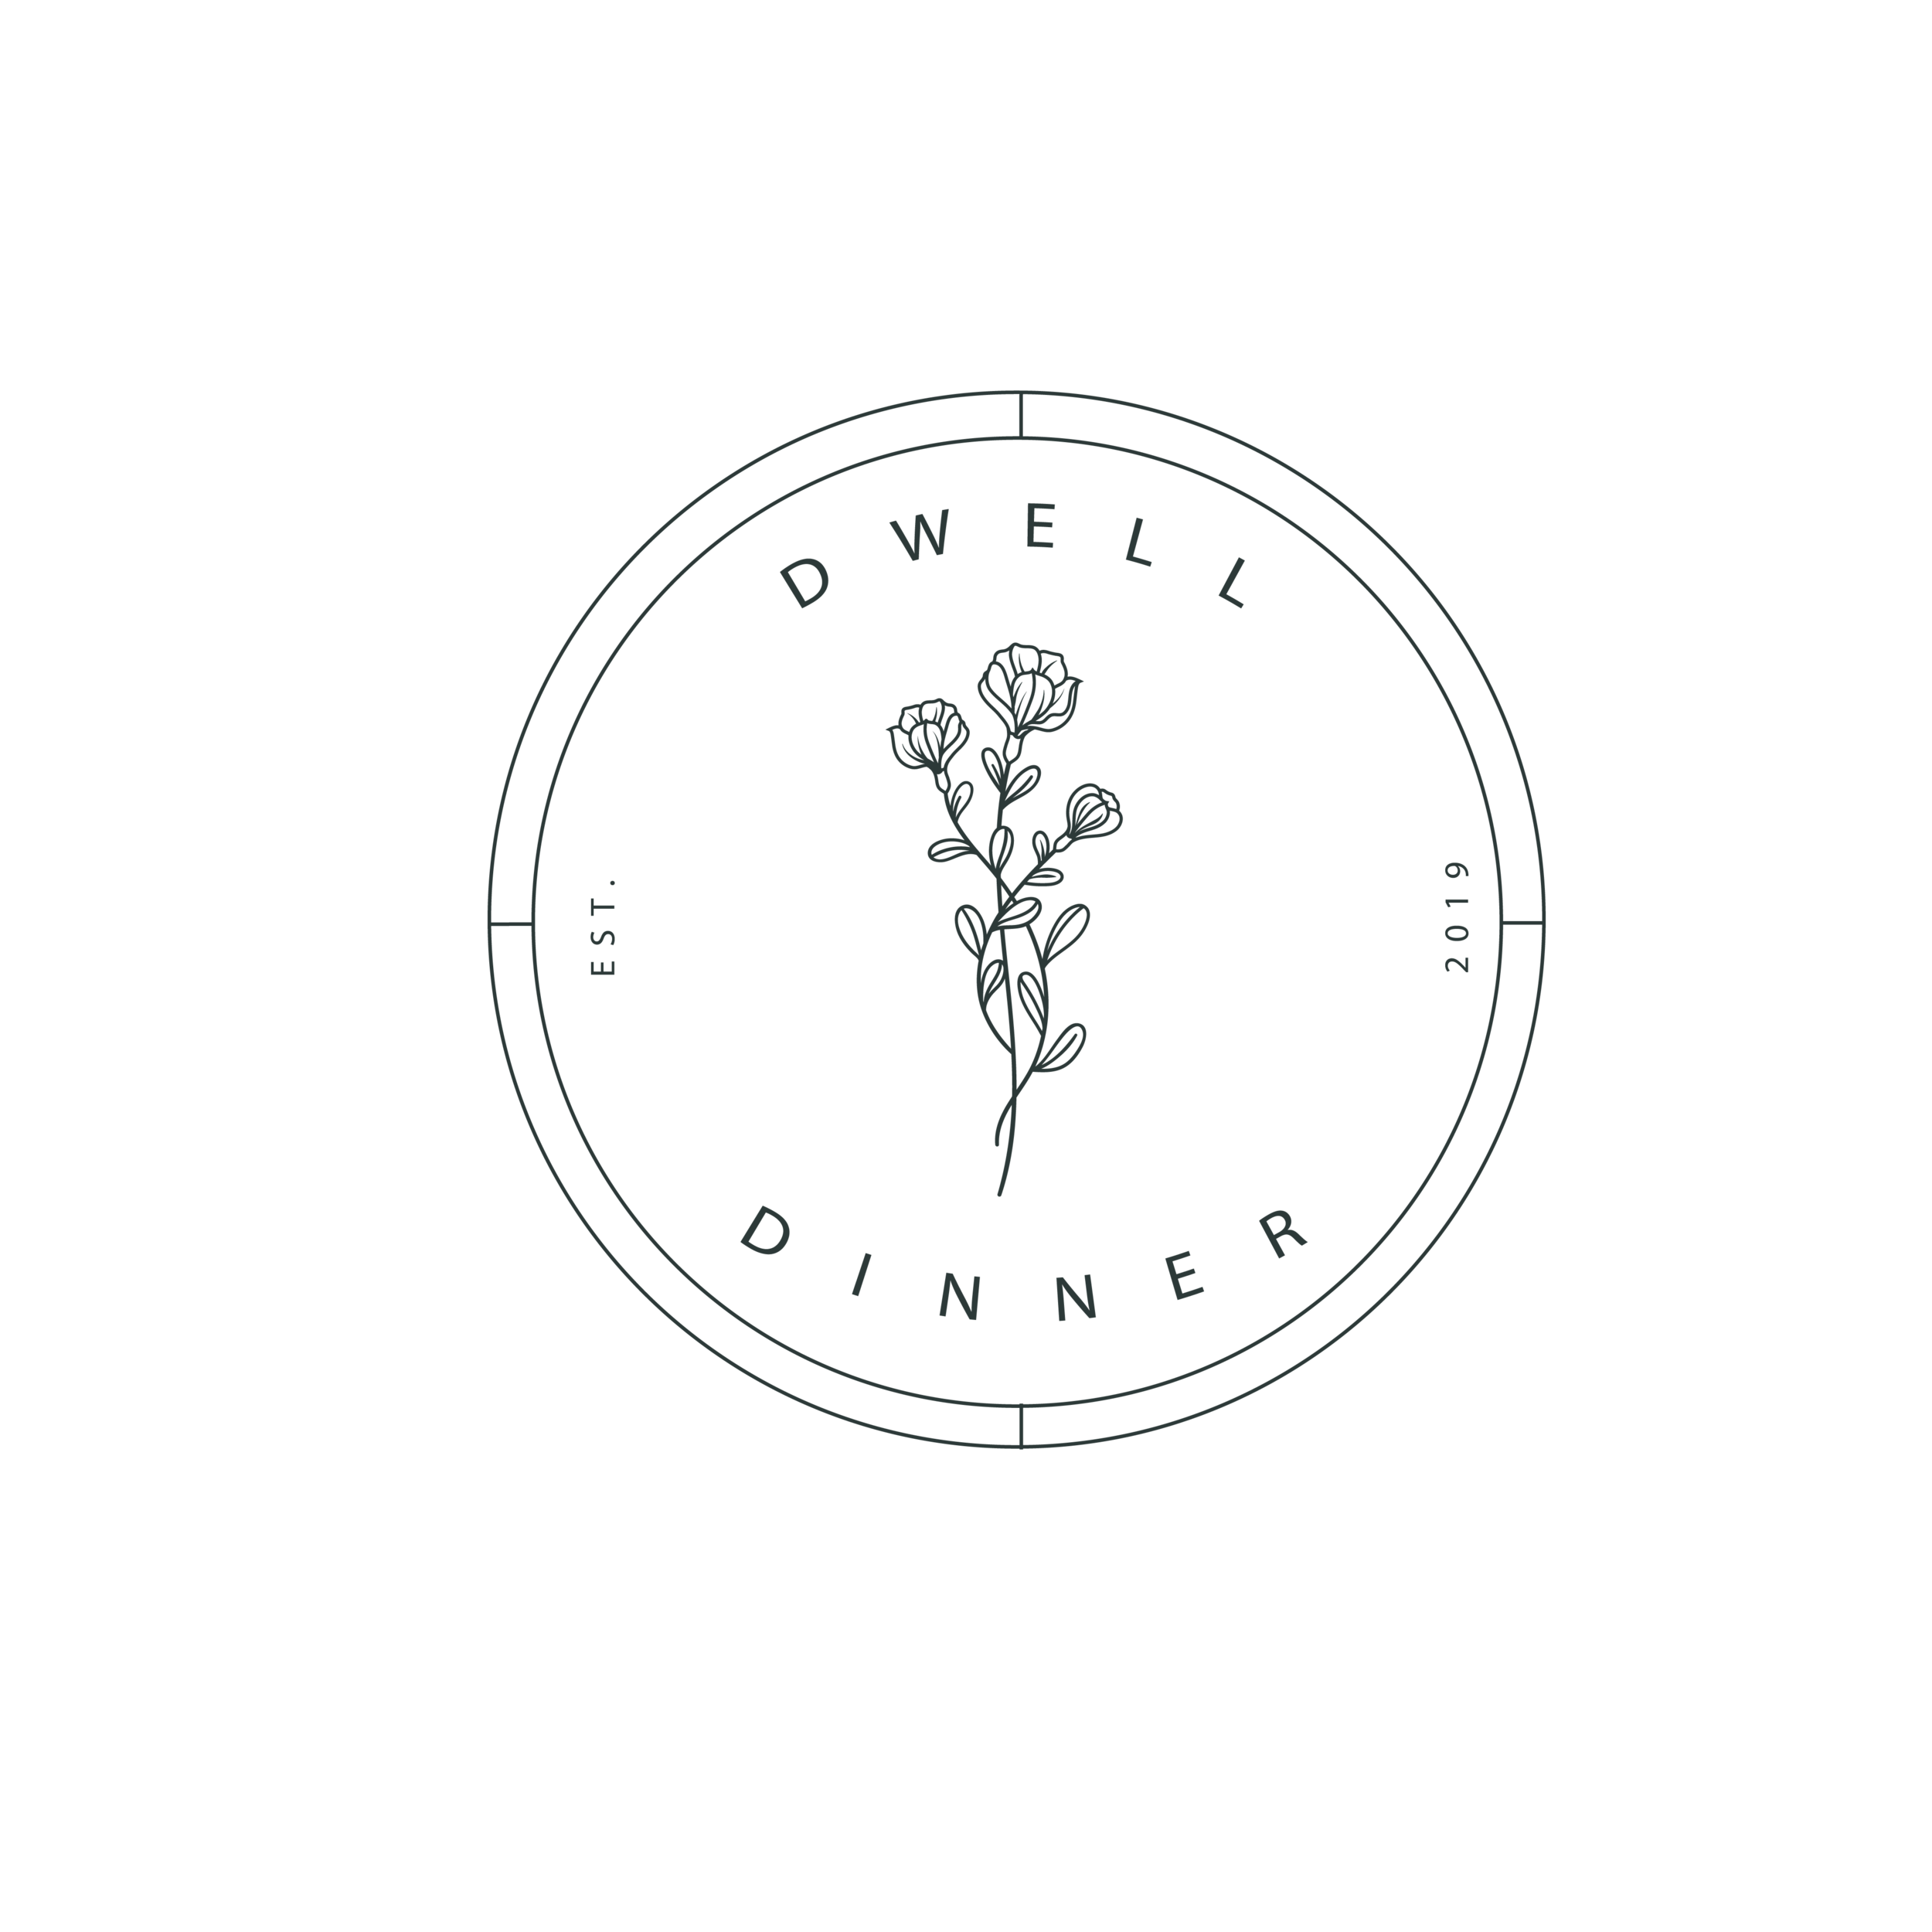 DWELLDINNER_Logos_OutlineBlue.png